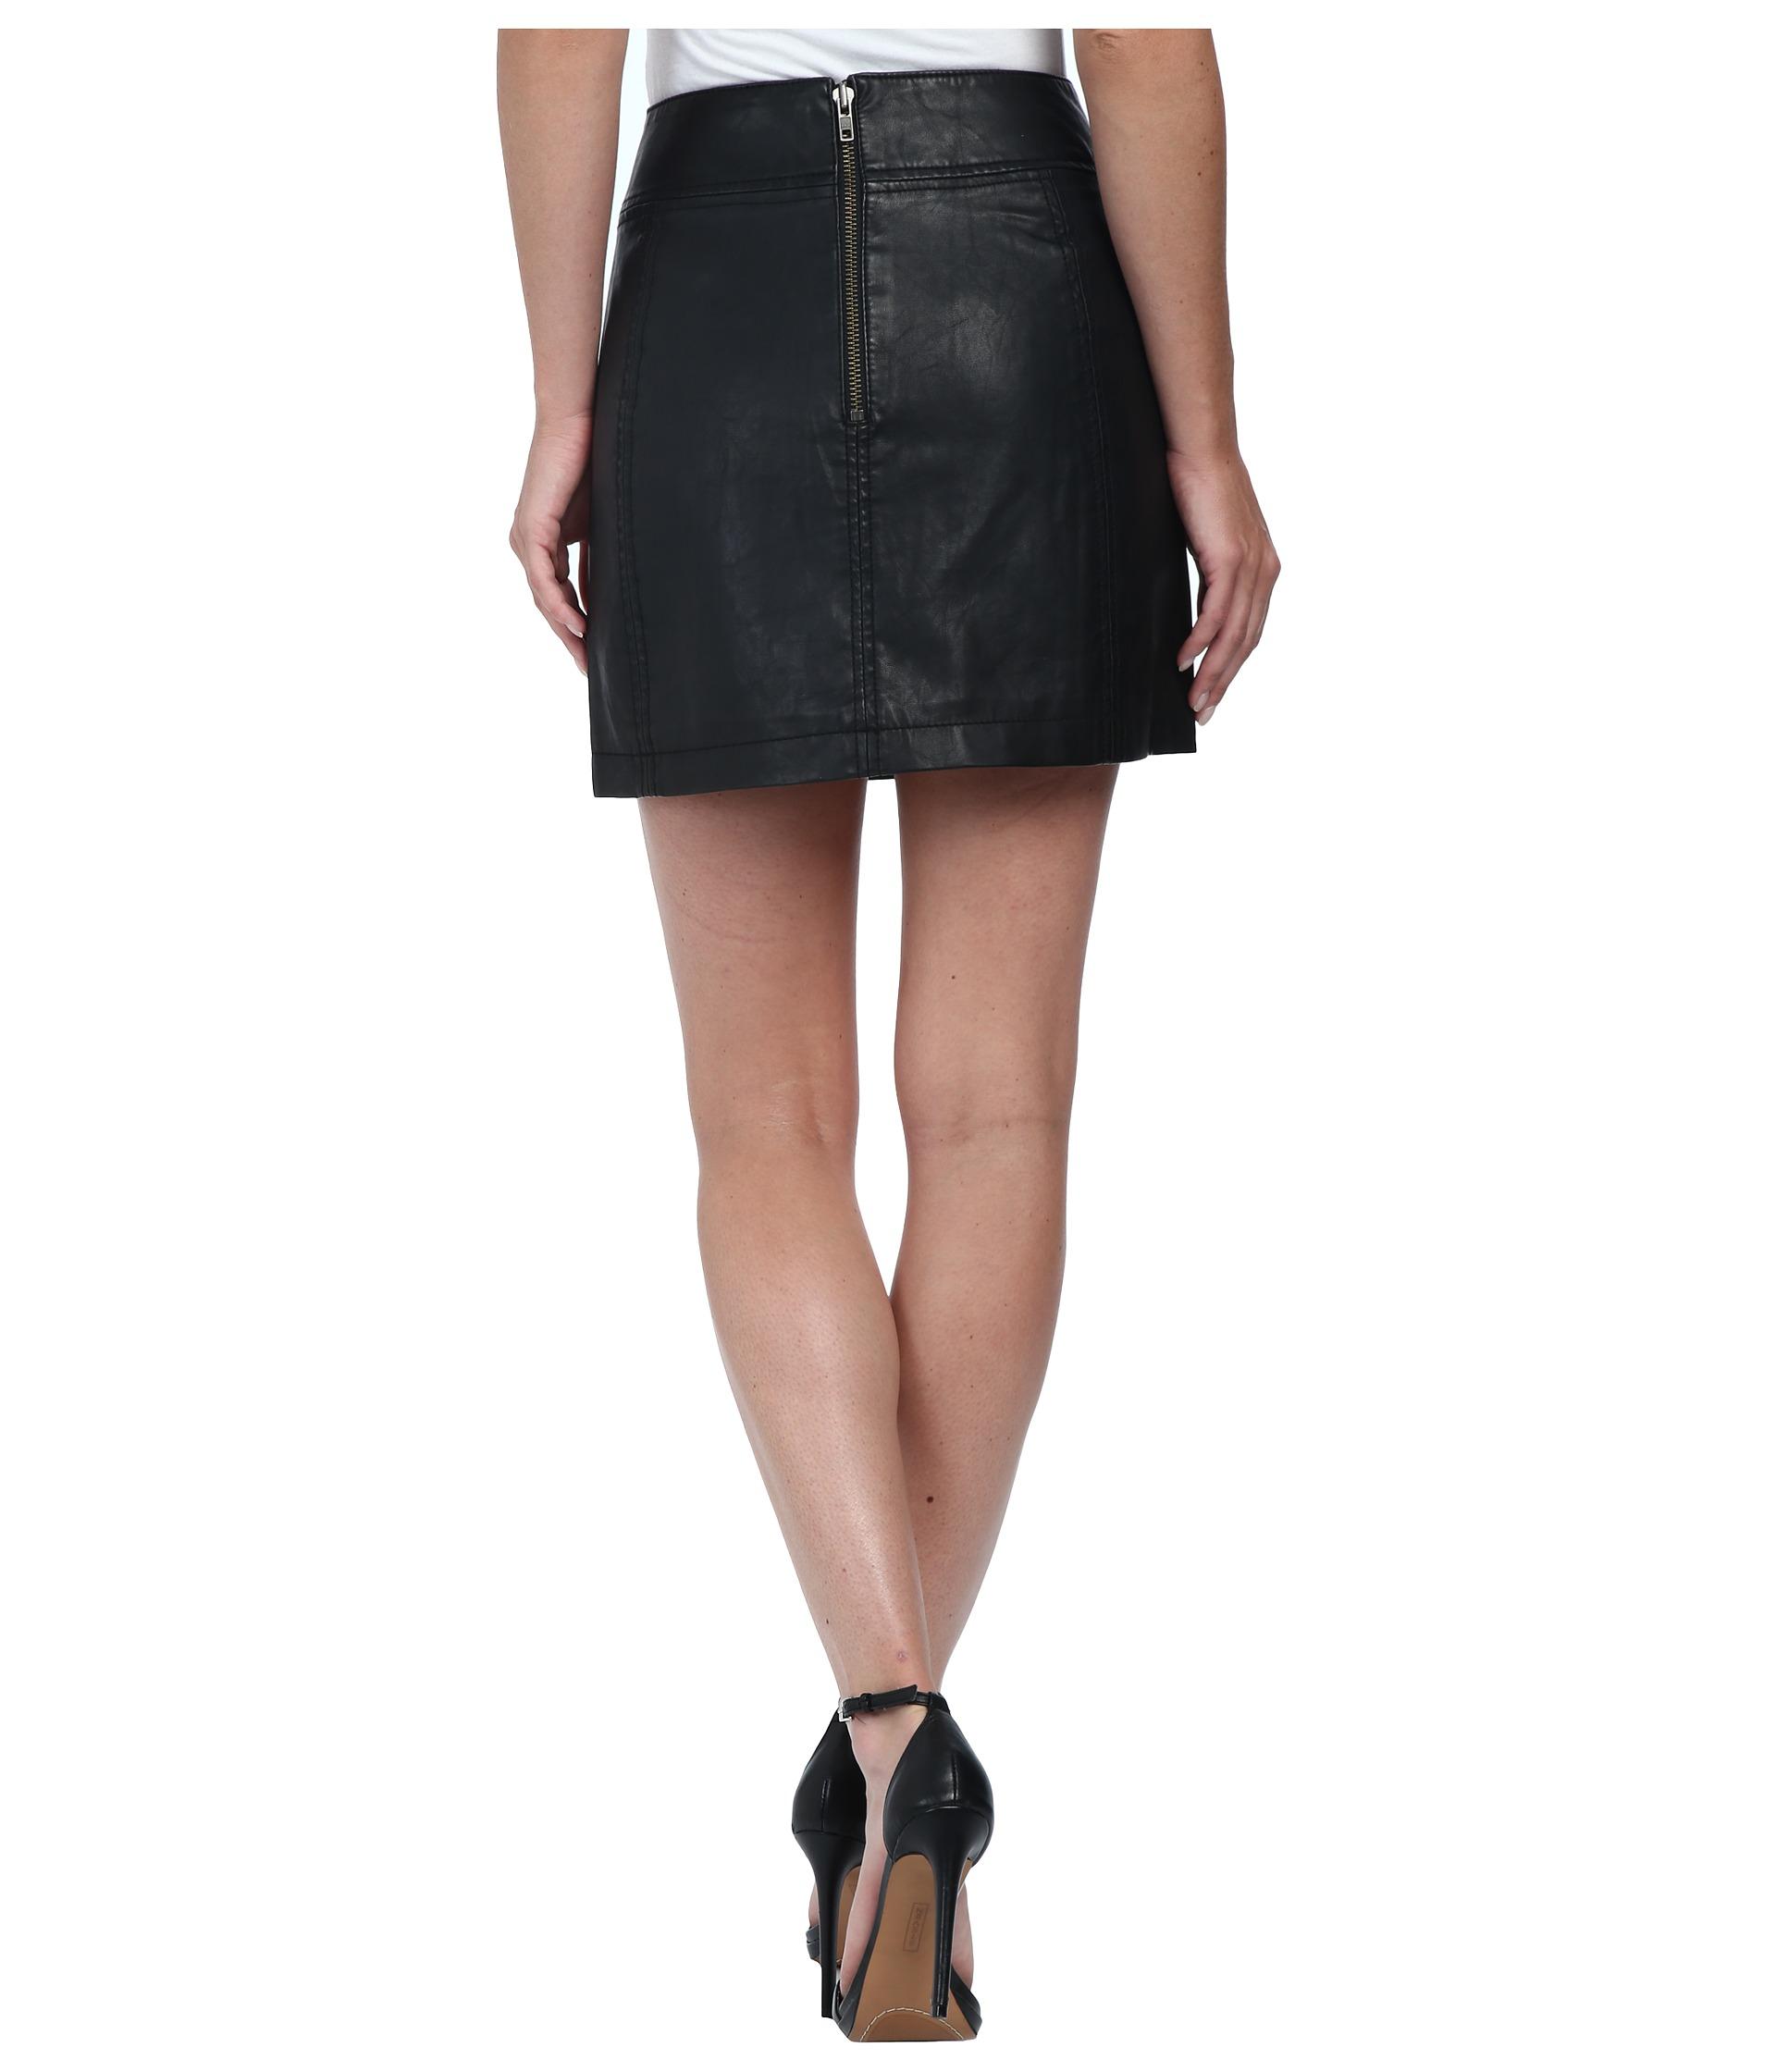 6eac4b9ed Free People Zip To It Vegan Leather Mini Skirt in Black - Lyst